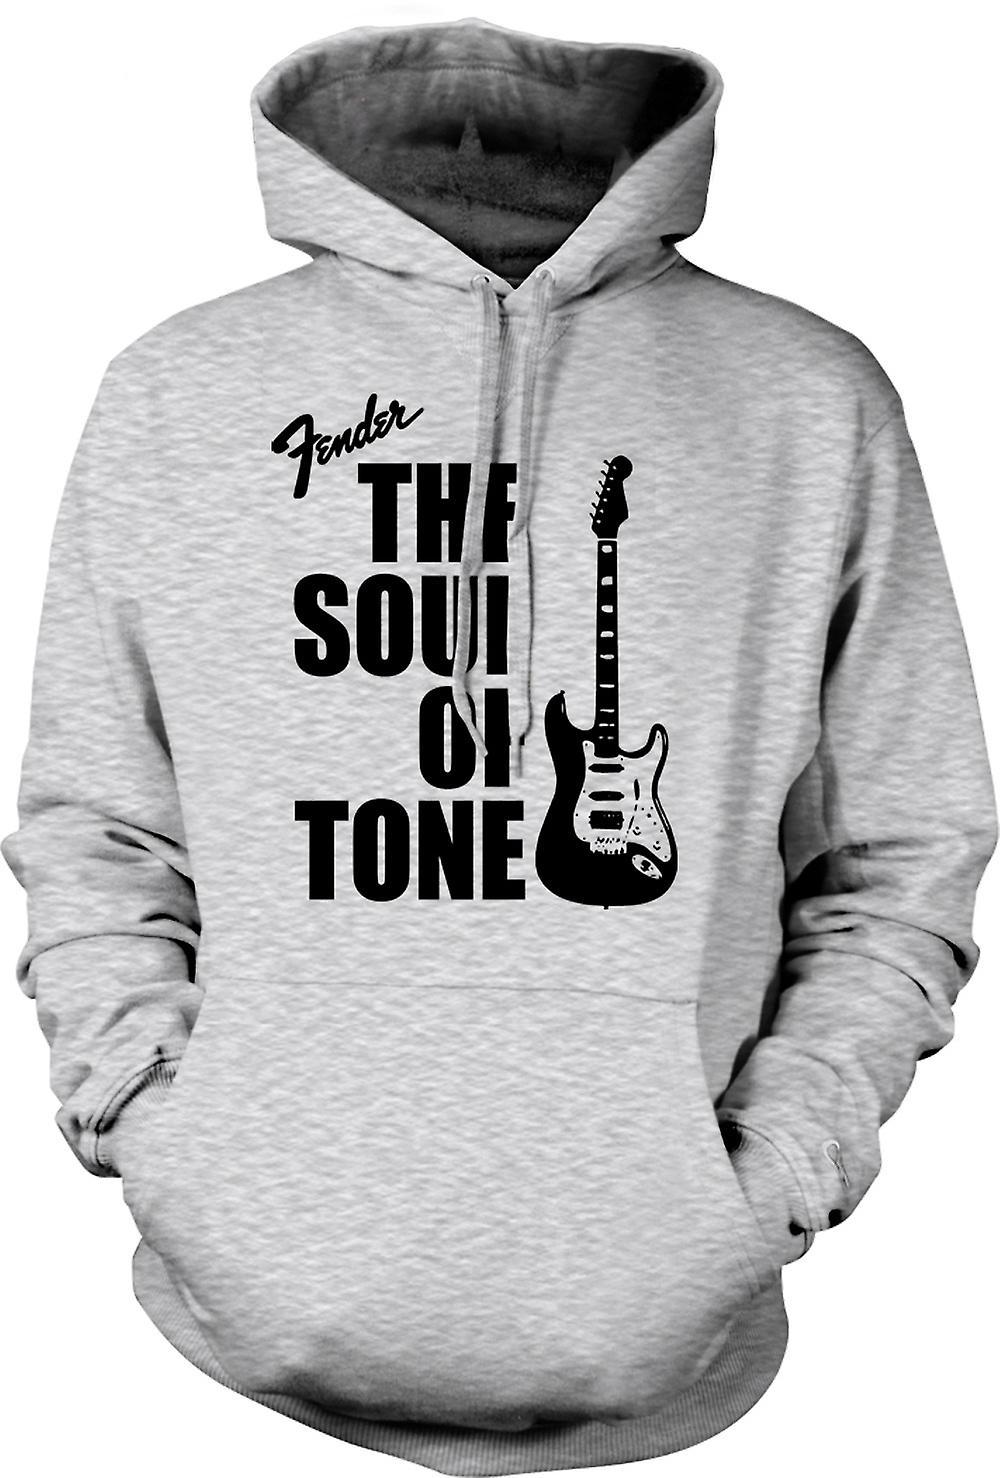 Mens Hoodie - Fender Strat Soul Tone Guitar